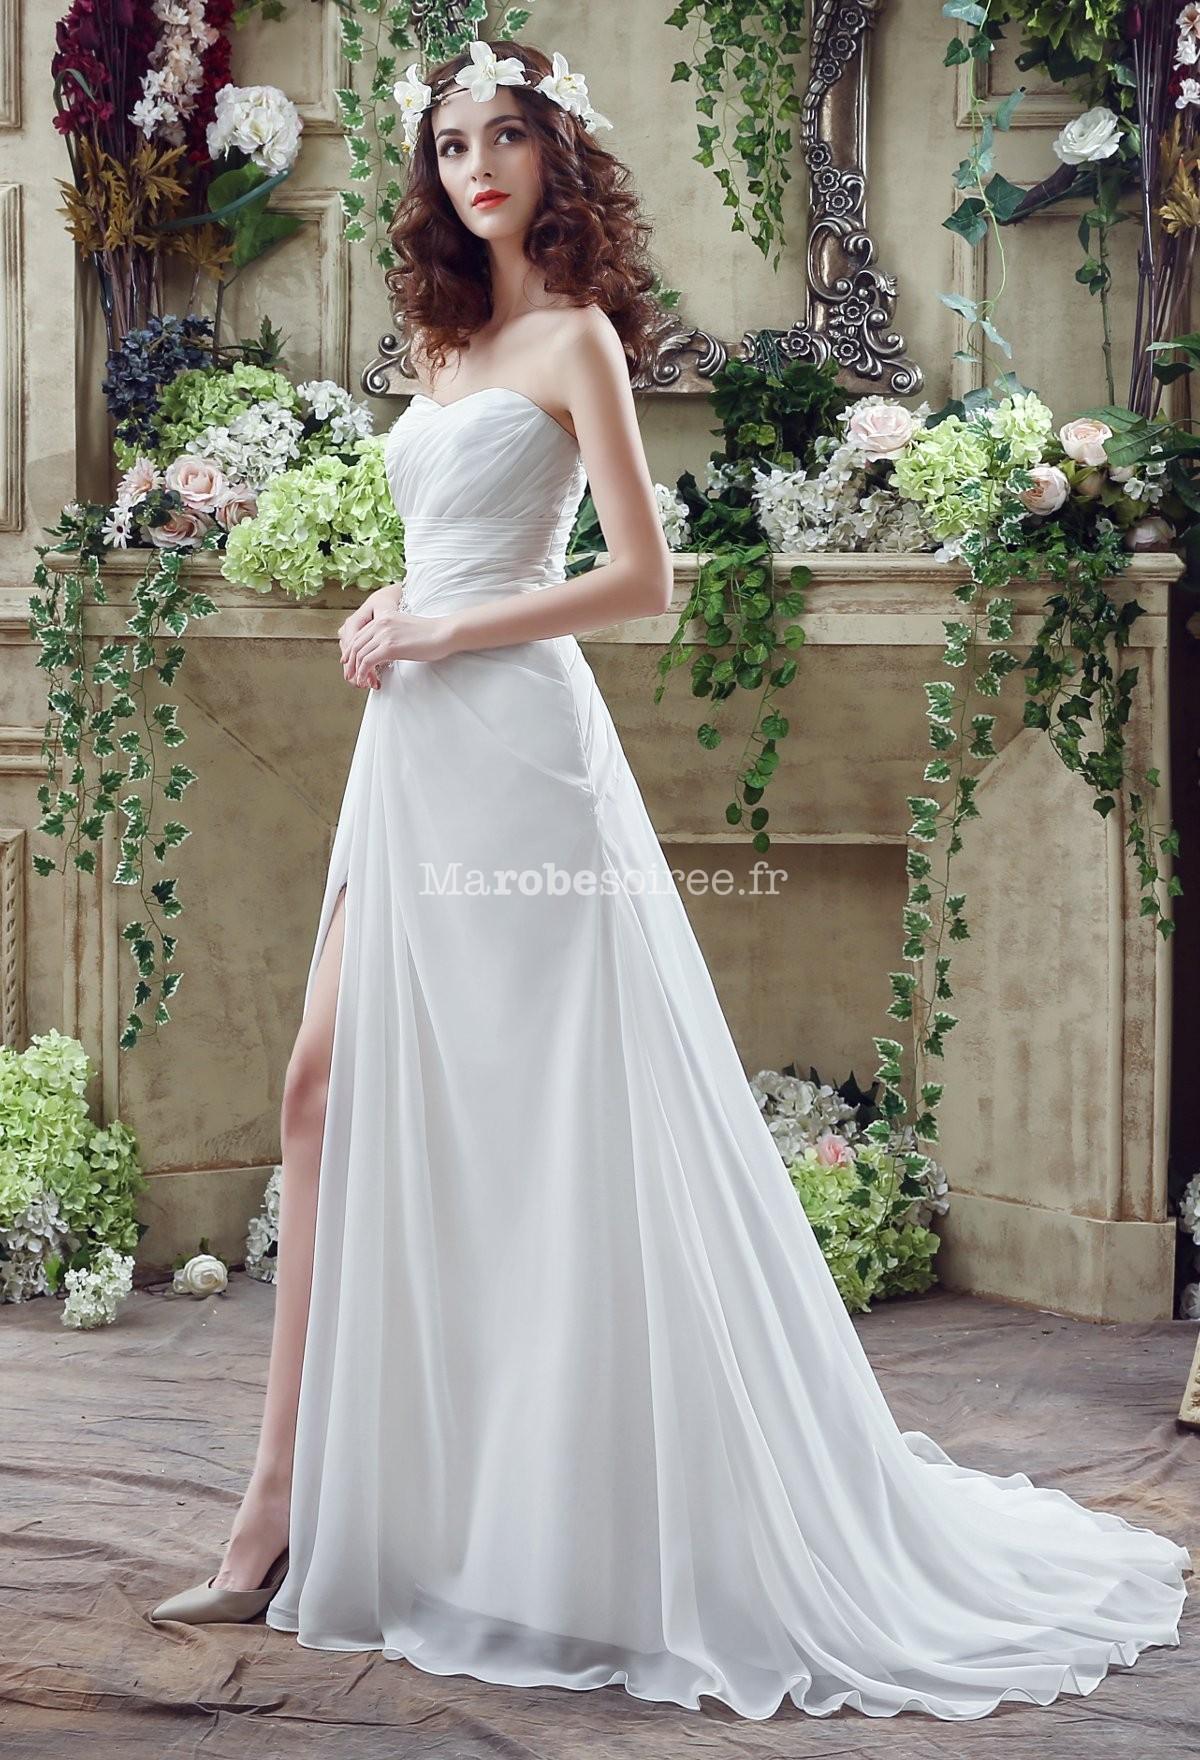 Robe de mari e mousseline ouverture fente for Robe de mariage